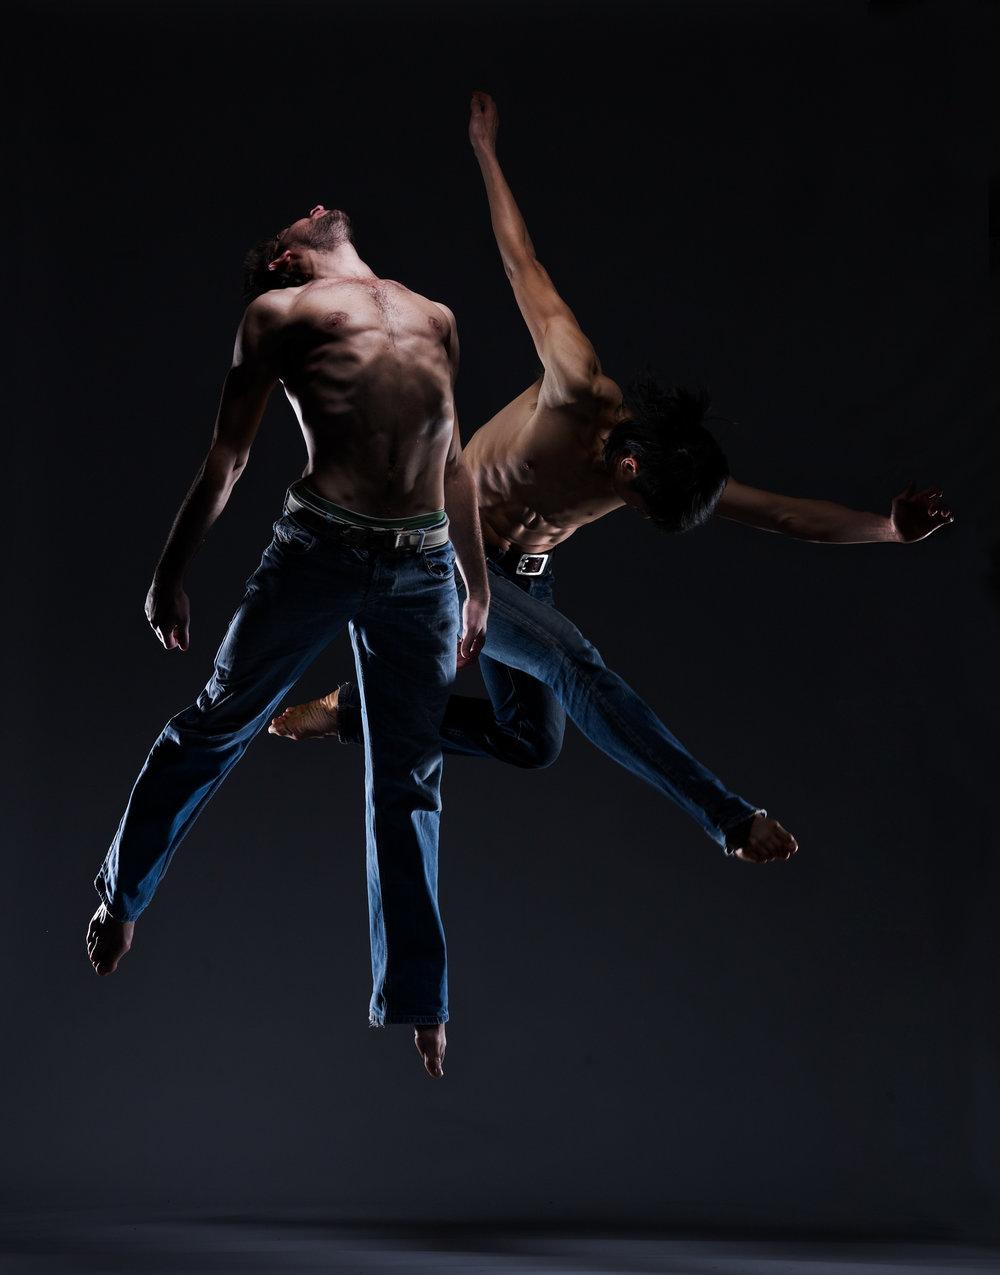 Bern_Ballet08_2-006697.jpg